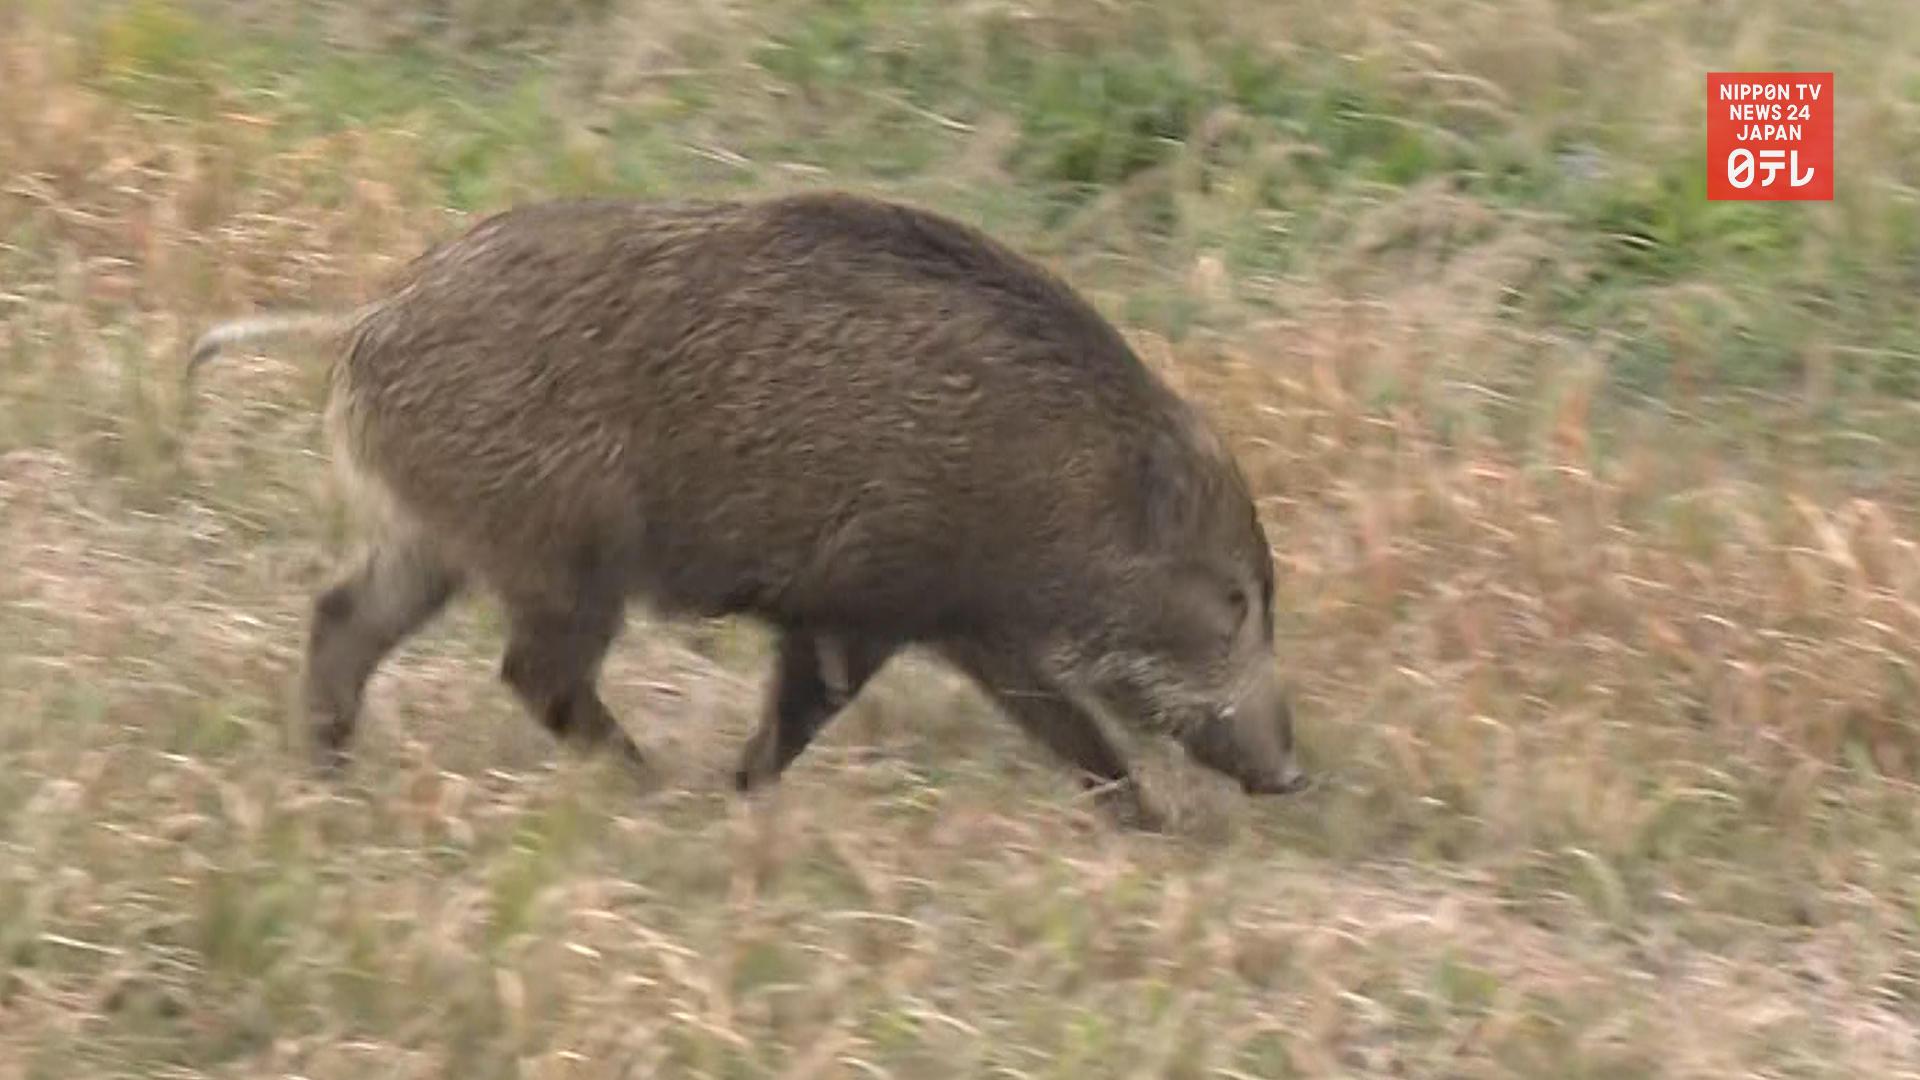 Wild boars loose in Tokyo and Saitama